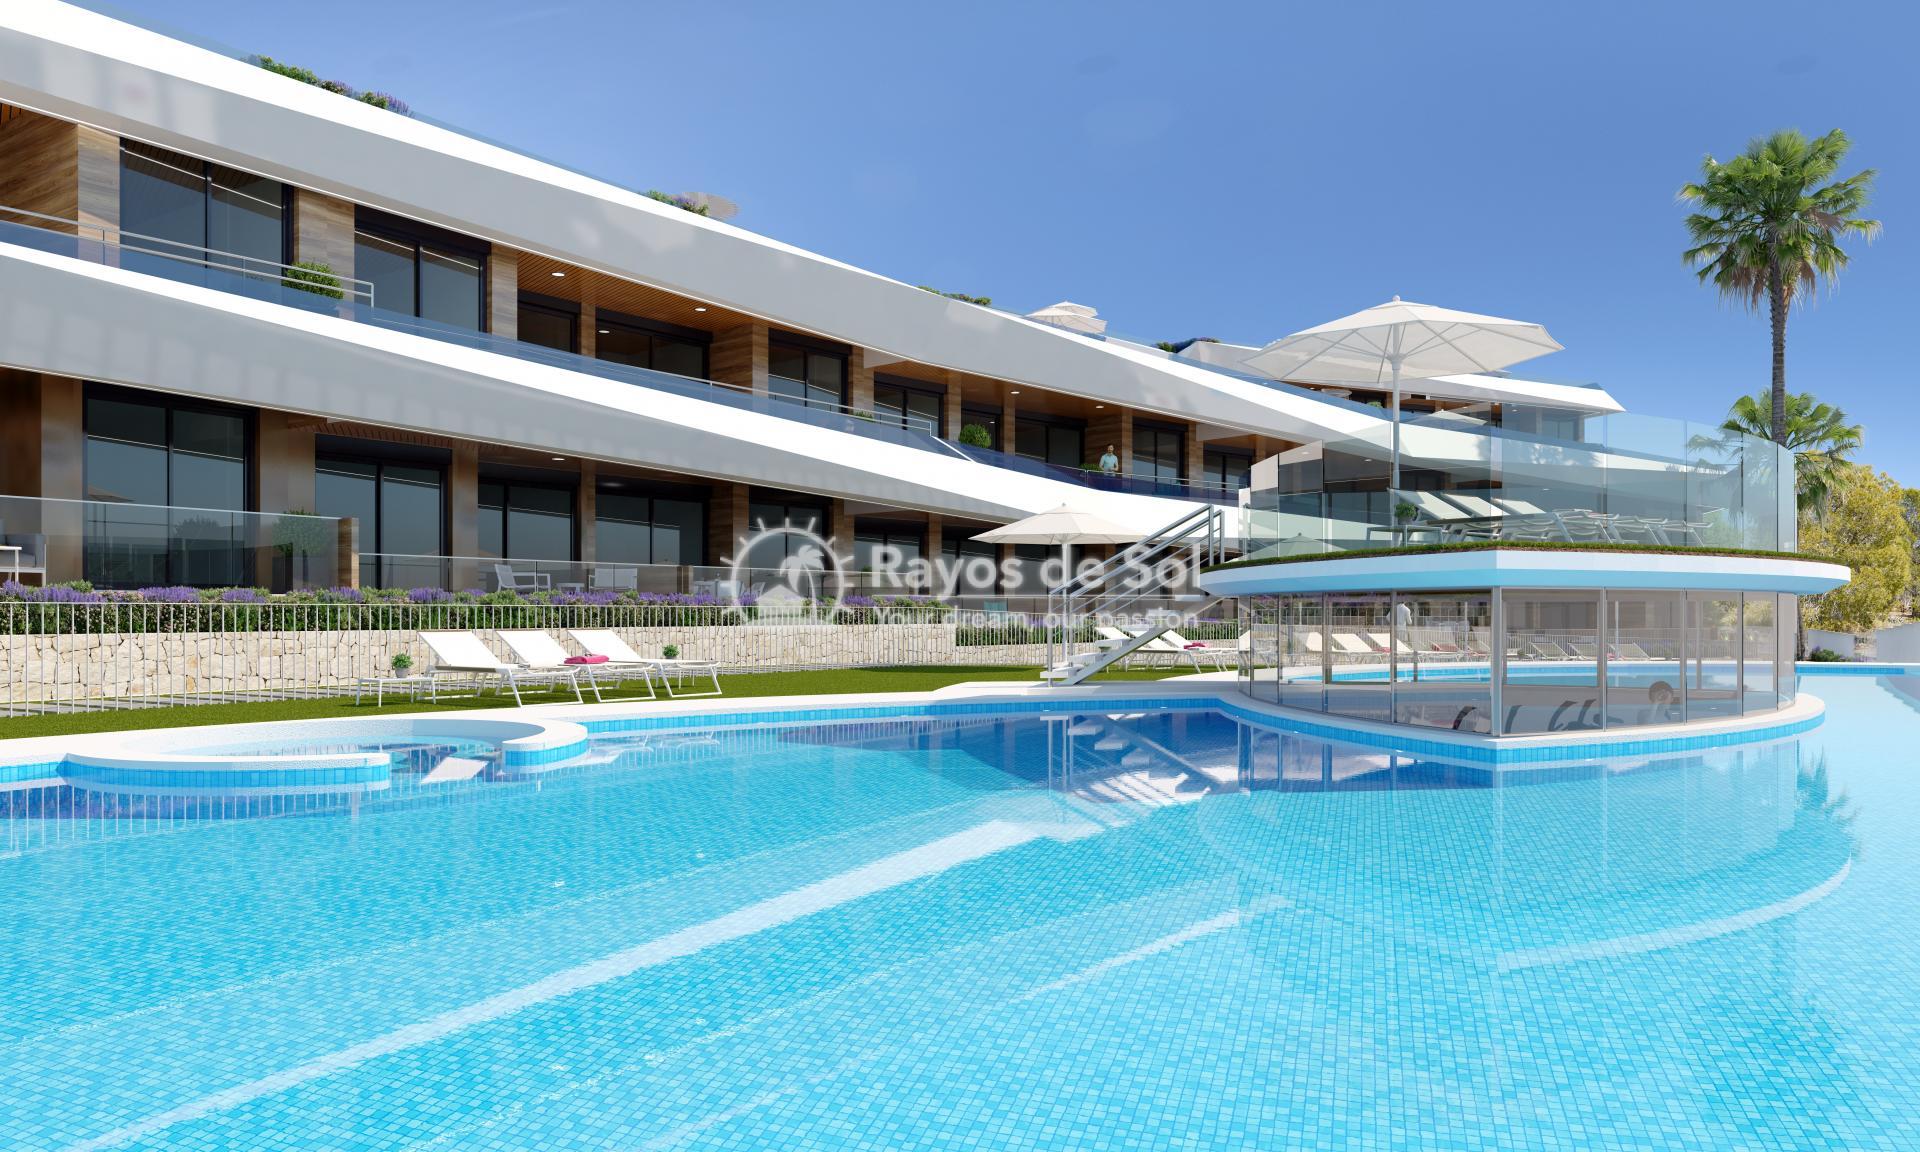 Apartment with seaviews  in Santa Pola, Costa Blanca (Aura apt2d) - 1